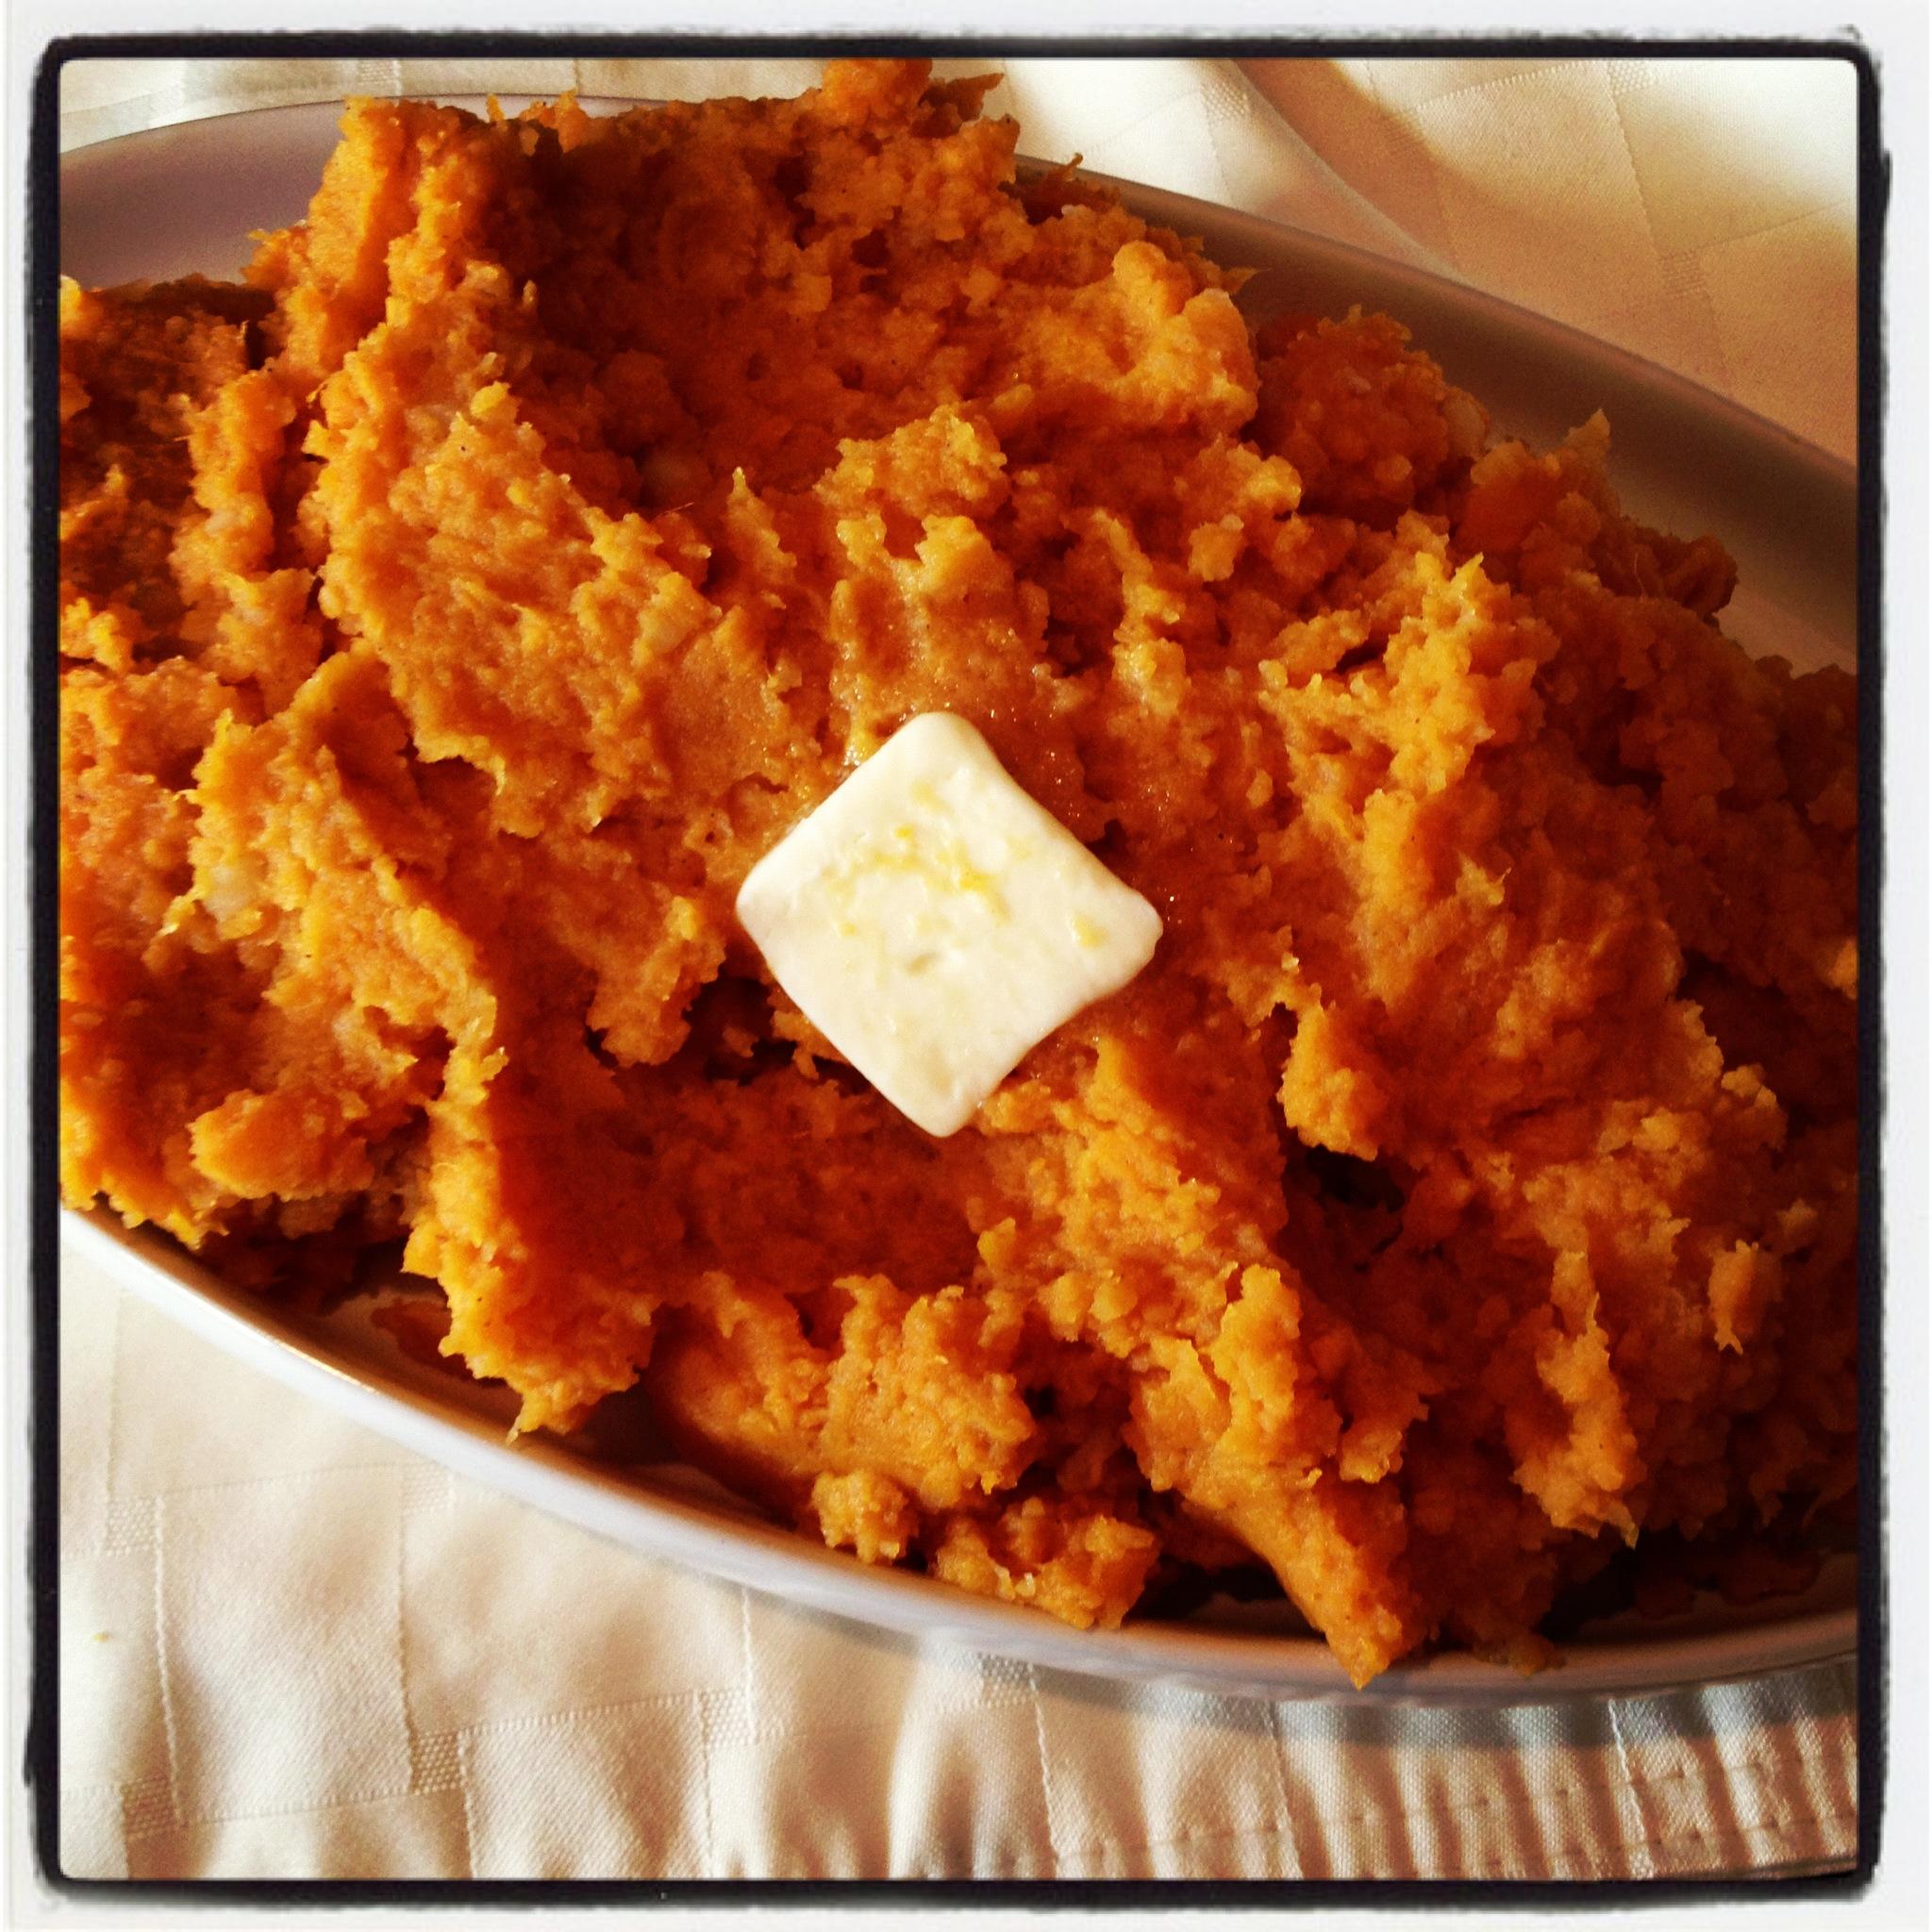 ... | Recipes, Cooking Tips, and Food News | Mashed Pumpkin & Potatoes